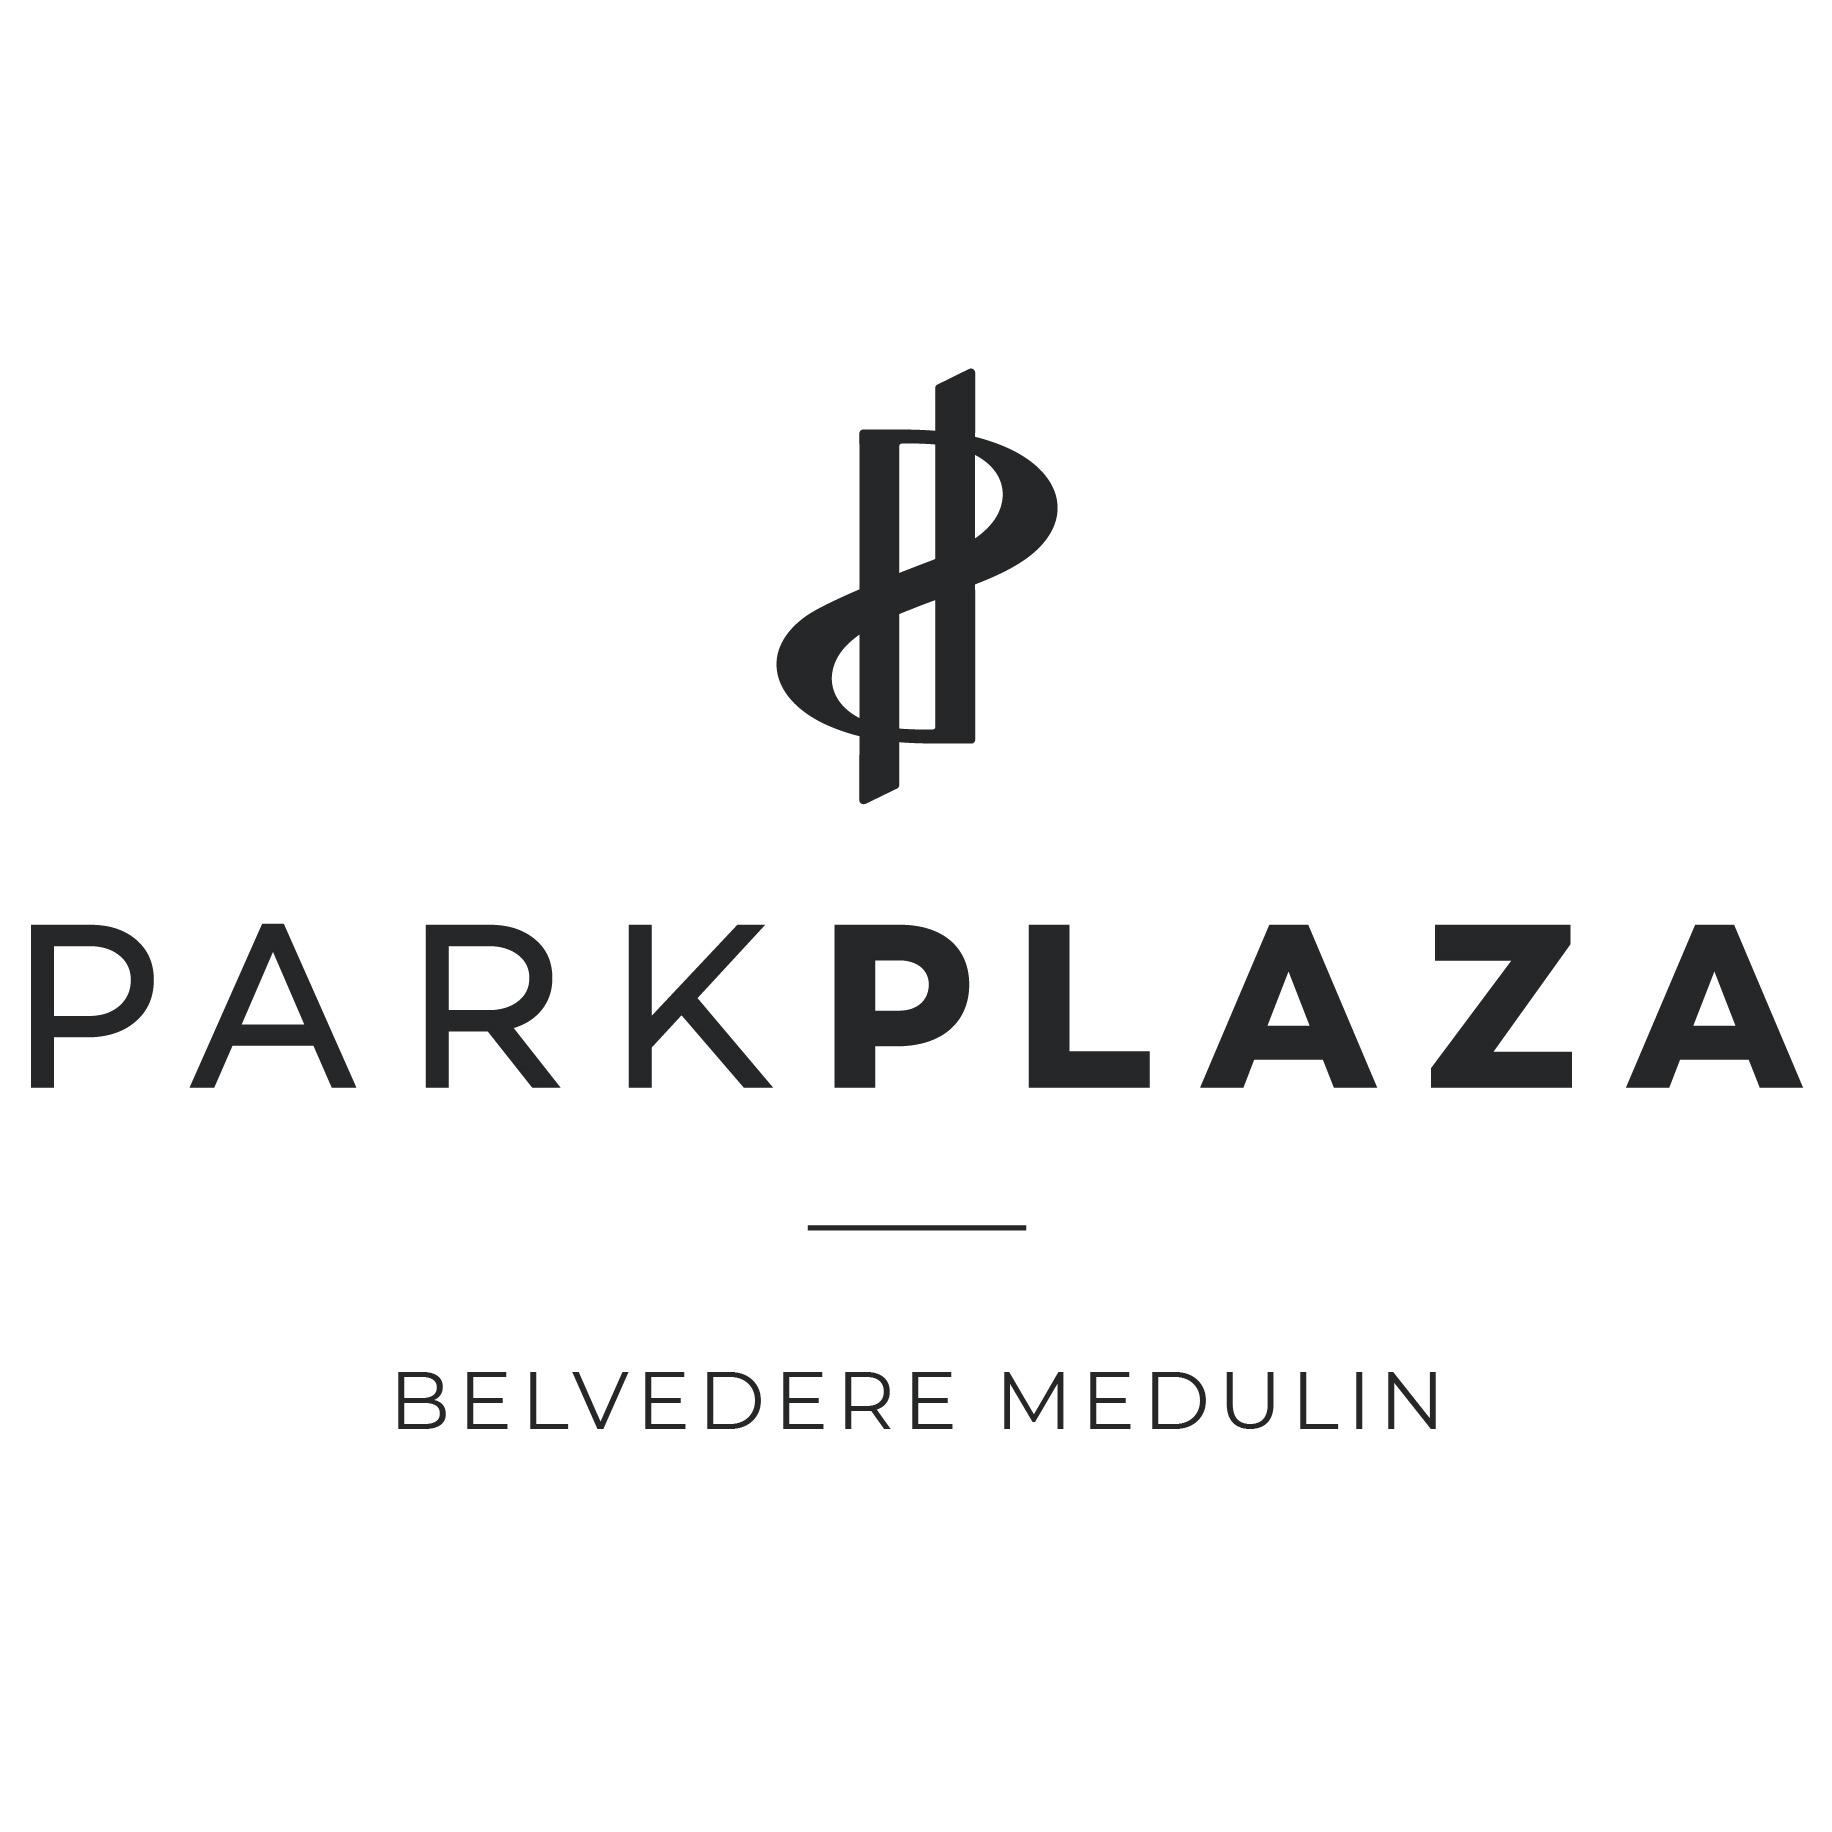 Park Plaza Belvedere Medulin